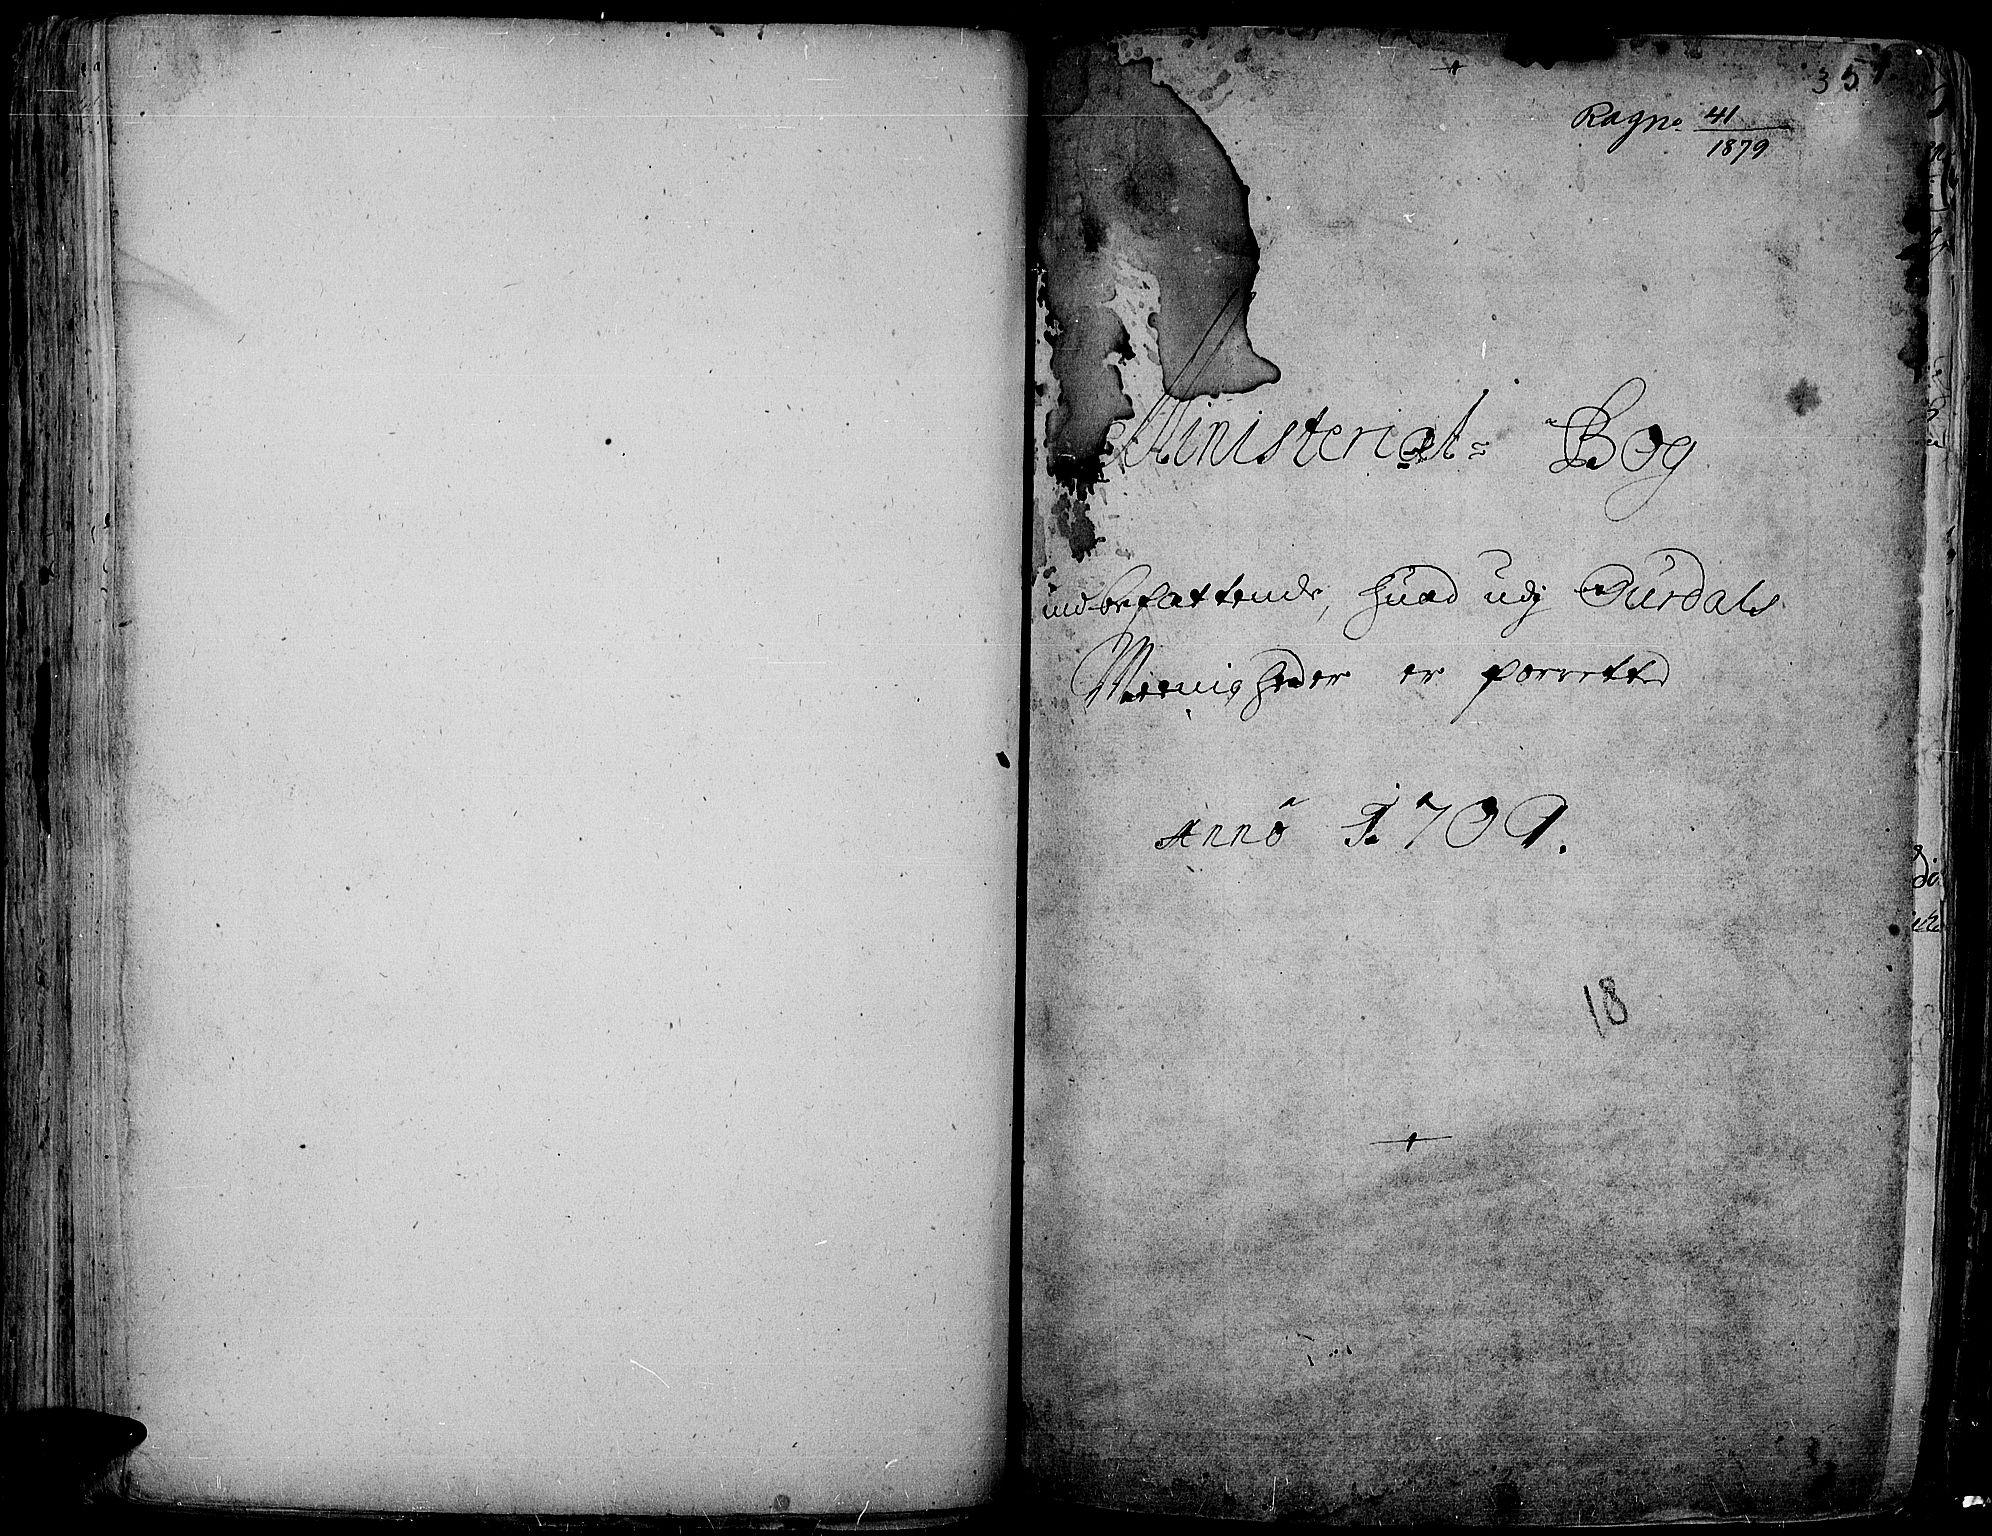 SAH, Aurdal prestekontor, Ministerialbok nr. 1-3, 1692-1730, s. 351